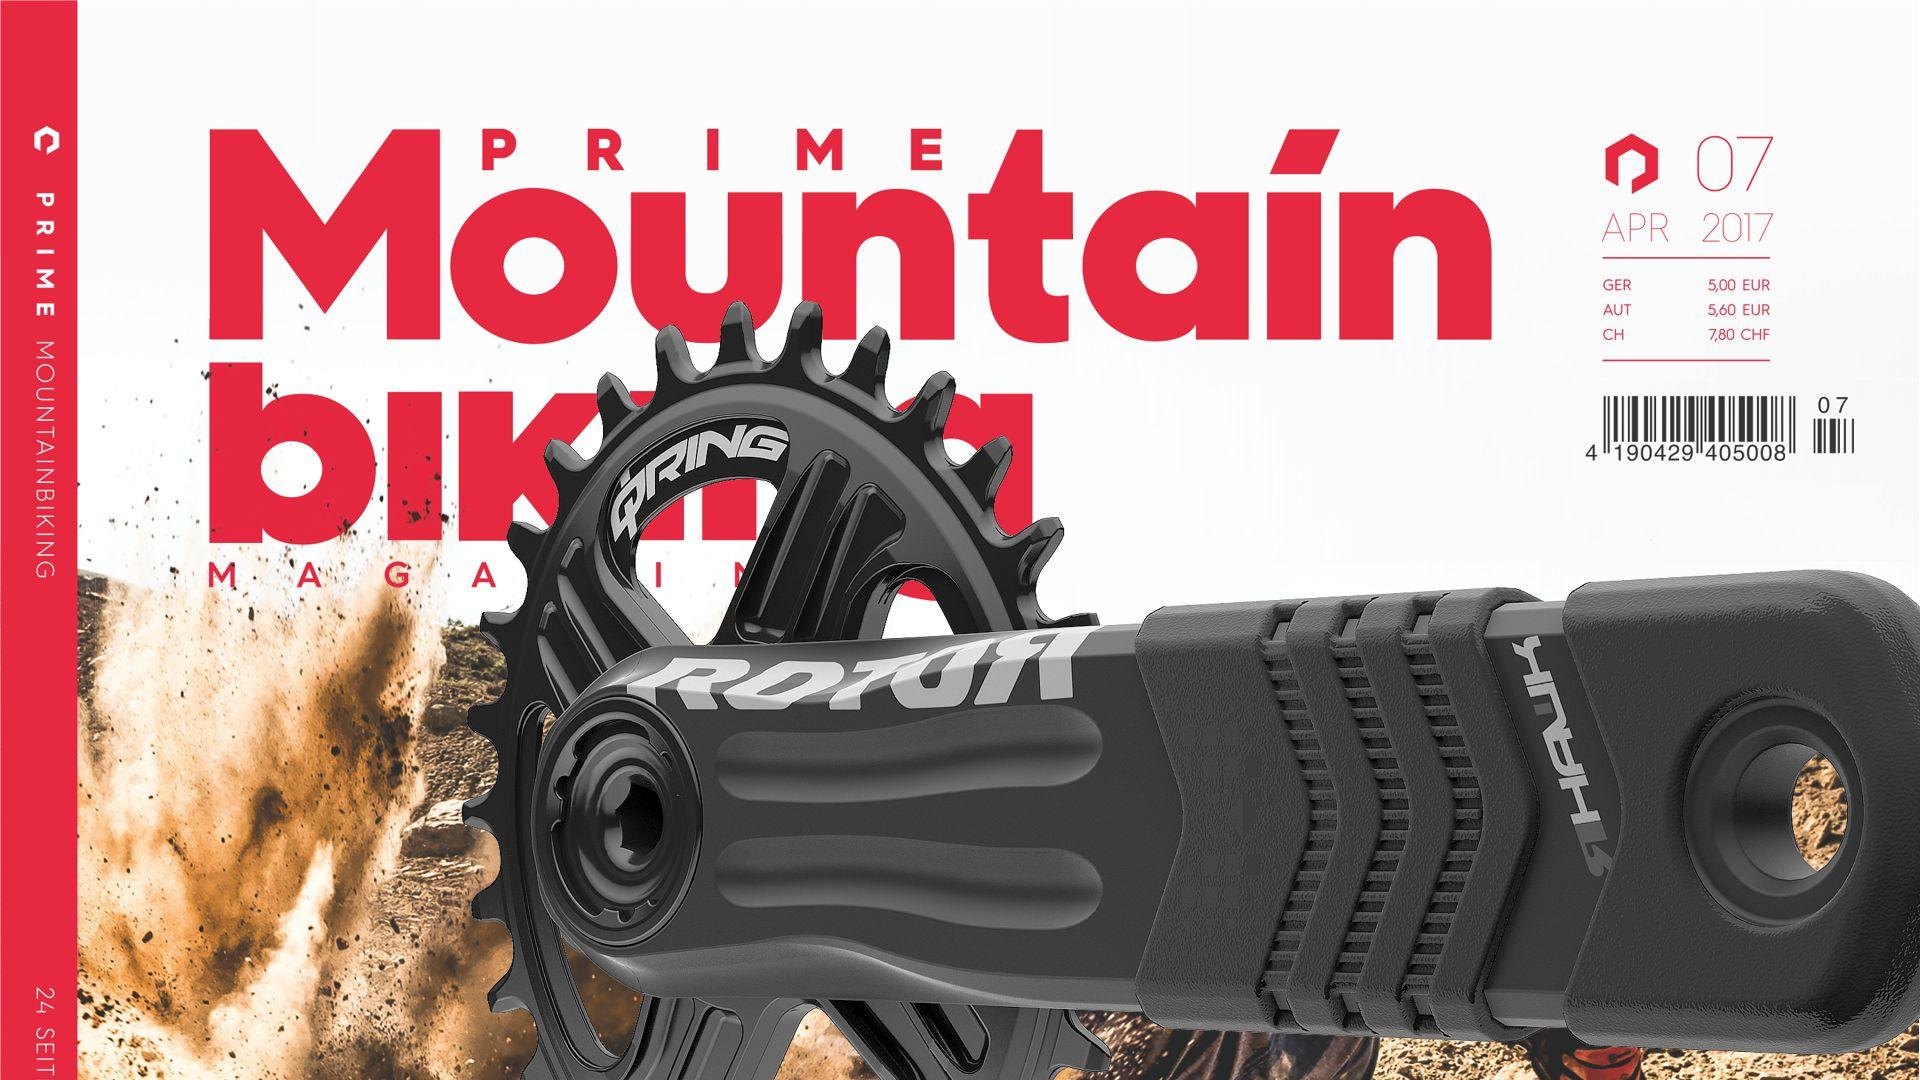 Prime Moubntainbiking - ROTOR Enduro und Gravity-Kurbeln